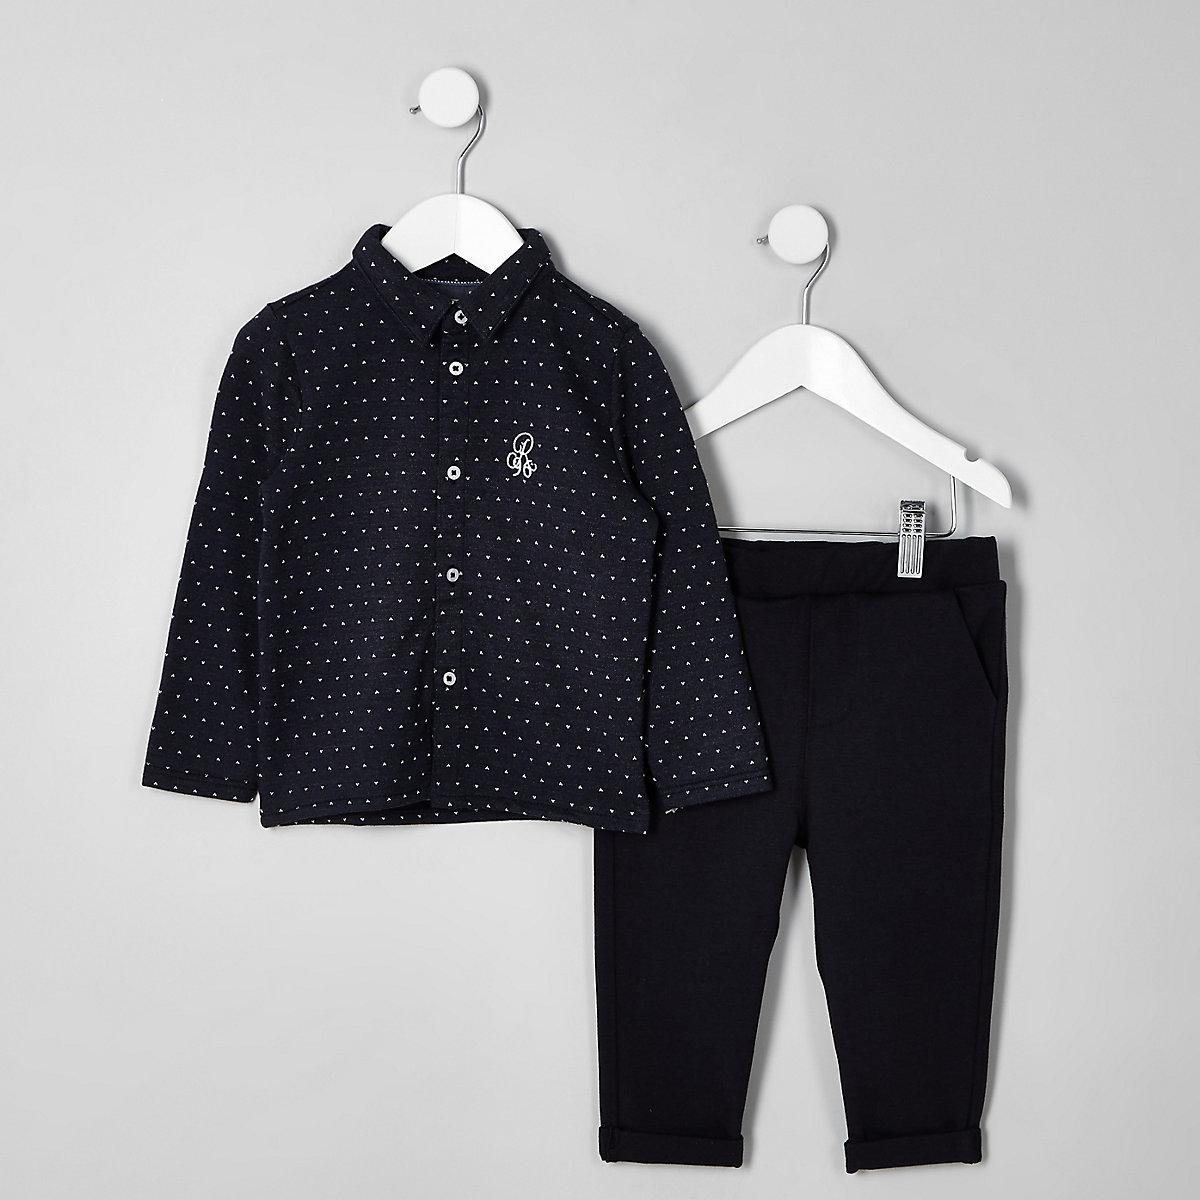 Boys navy jacquard shirt outfit